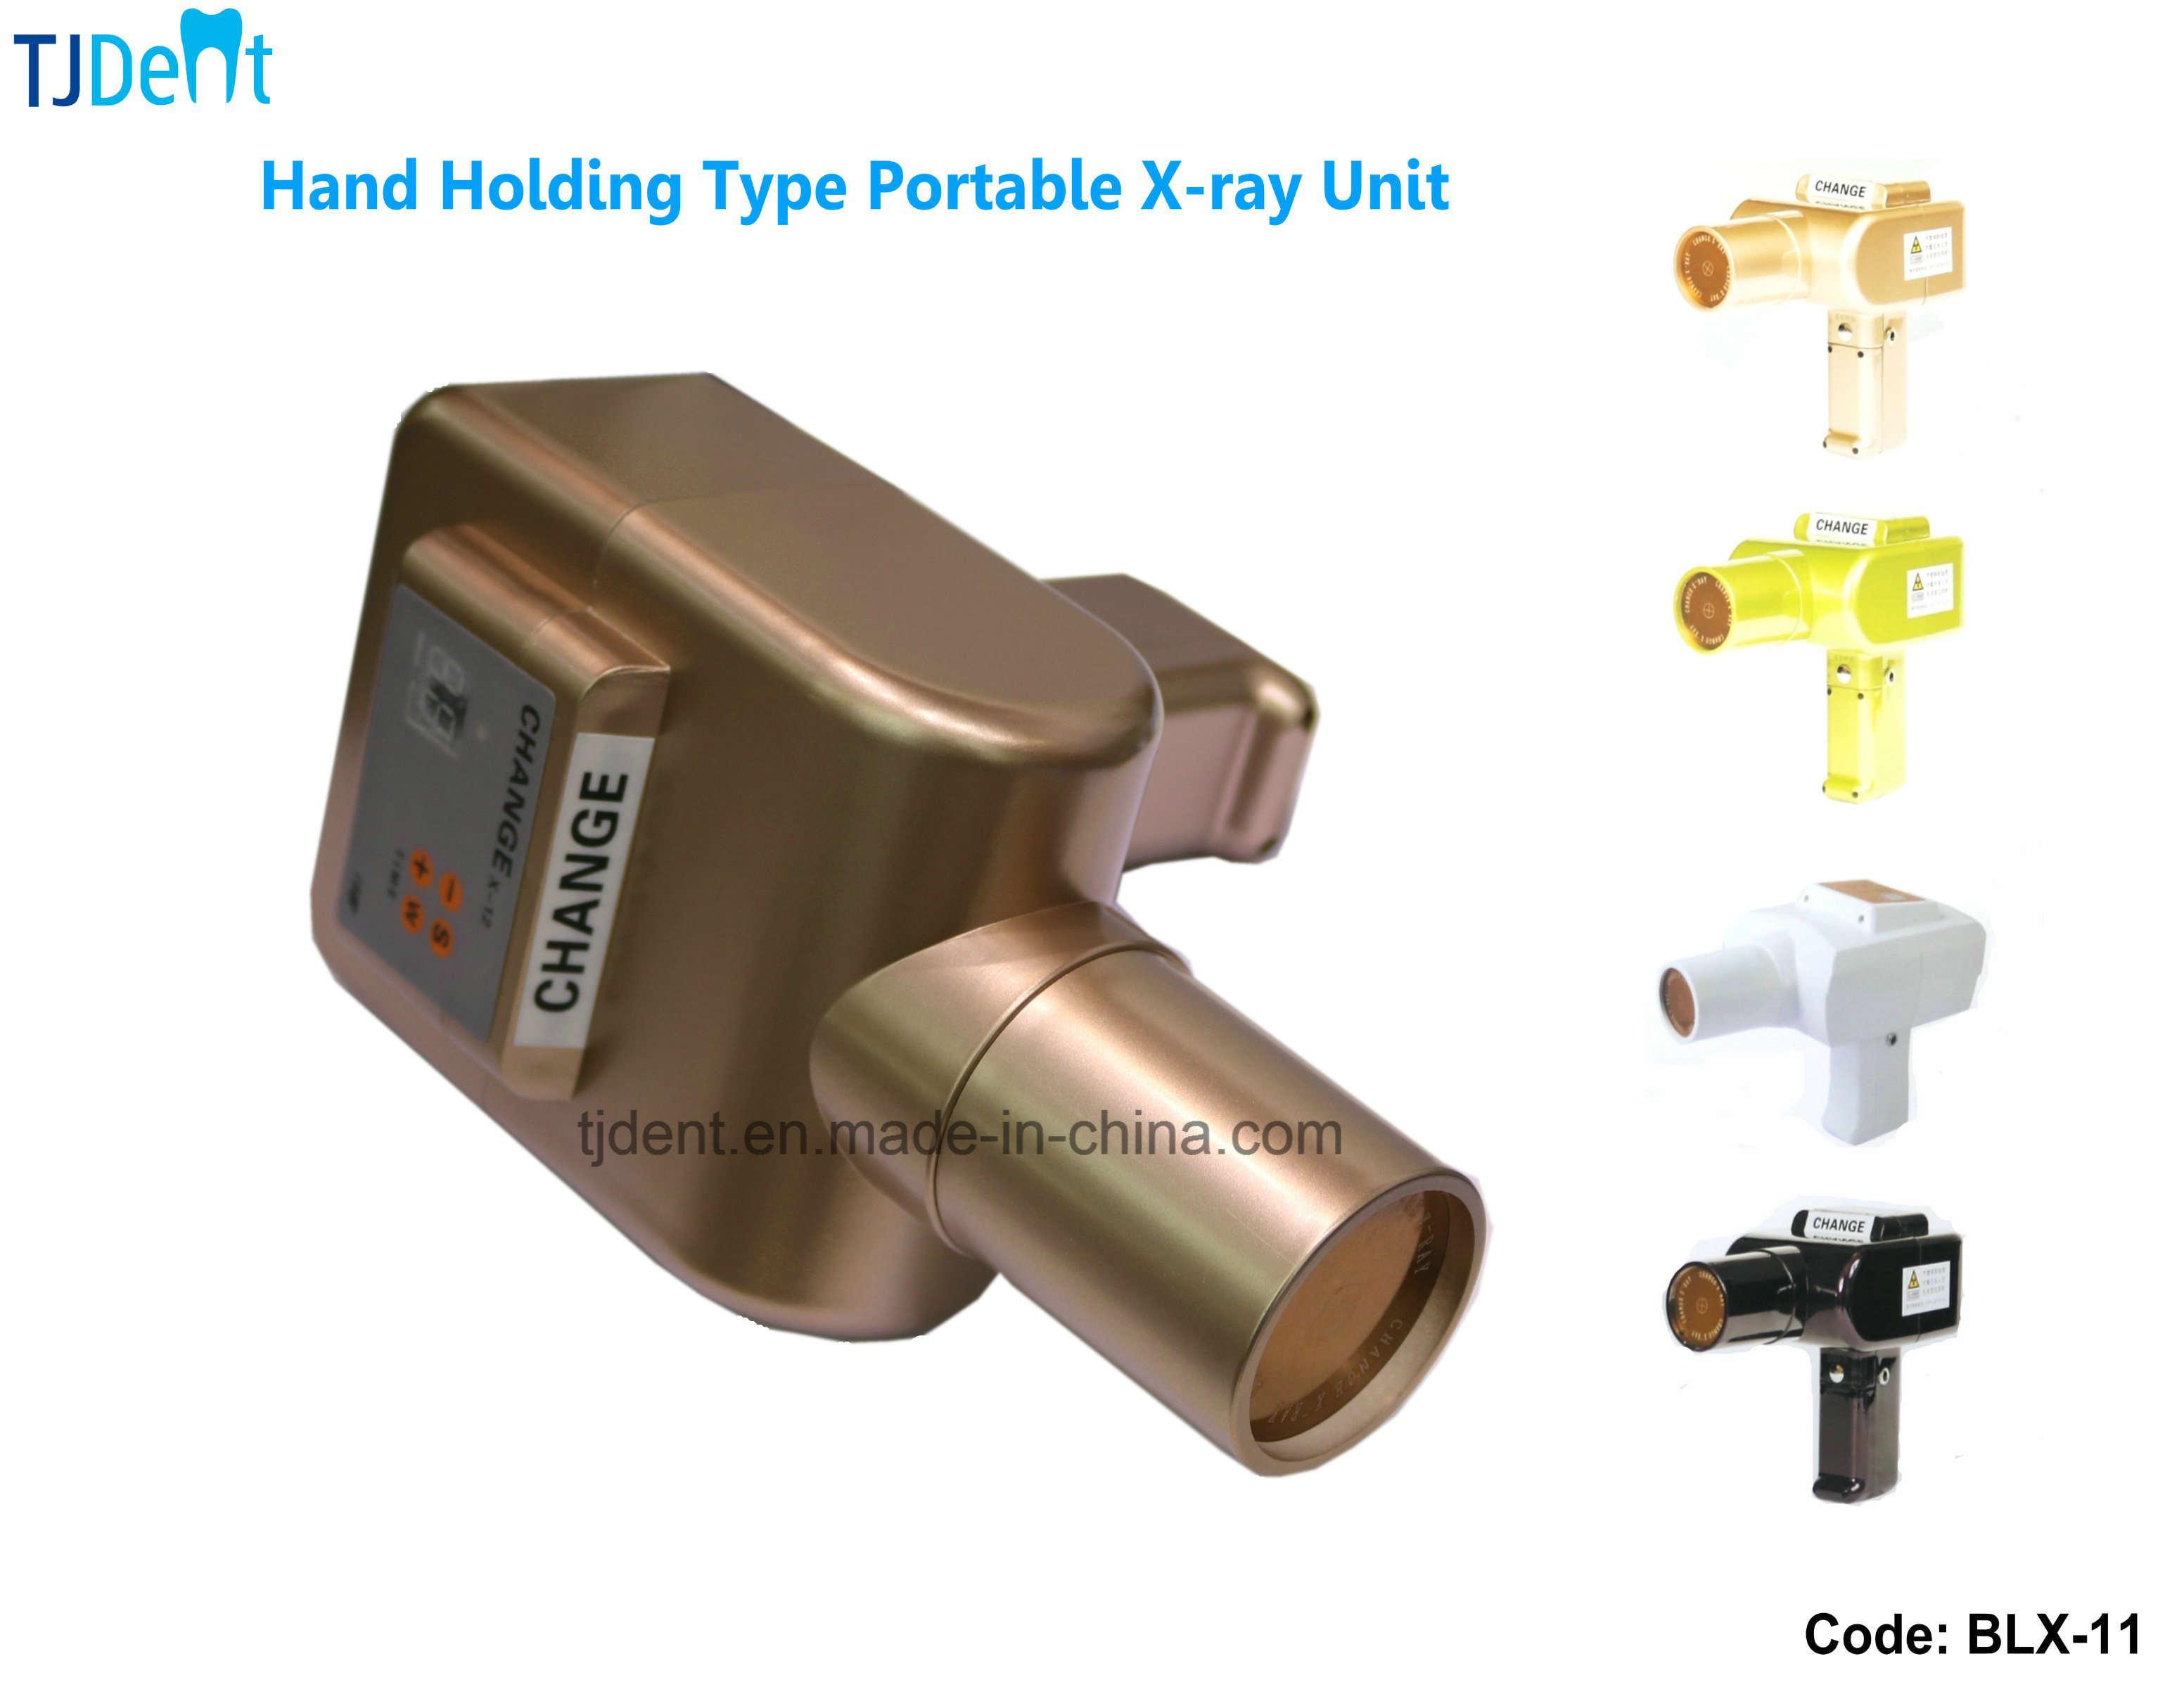 Hand Holding Type Portable Dental X Ray Unit (BLX-11)